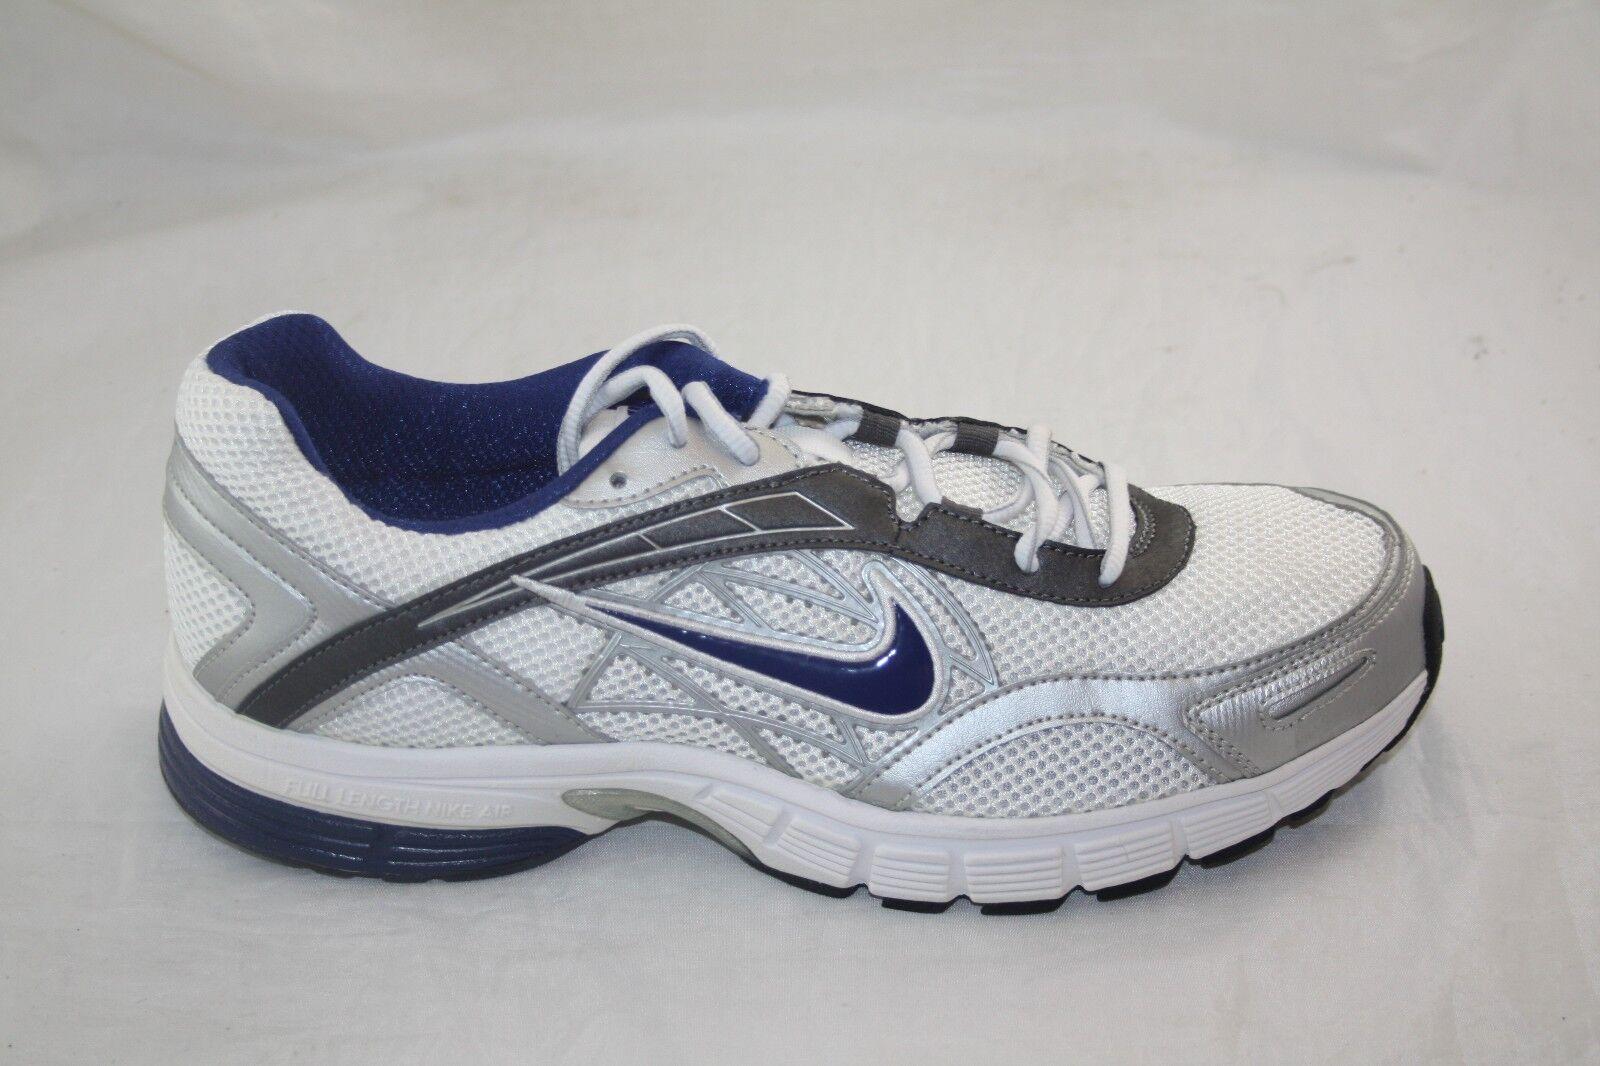 Los hombres de Nike Air alasis   Deep 4 MSL 432156-101 Blanco Deep  Royal metallc gris oscuro 7ce00b